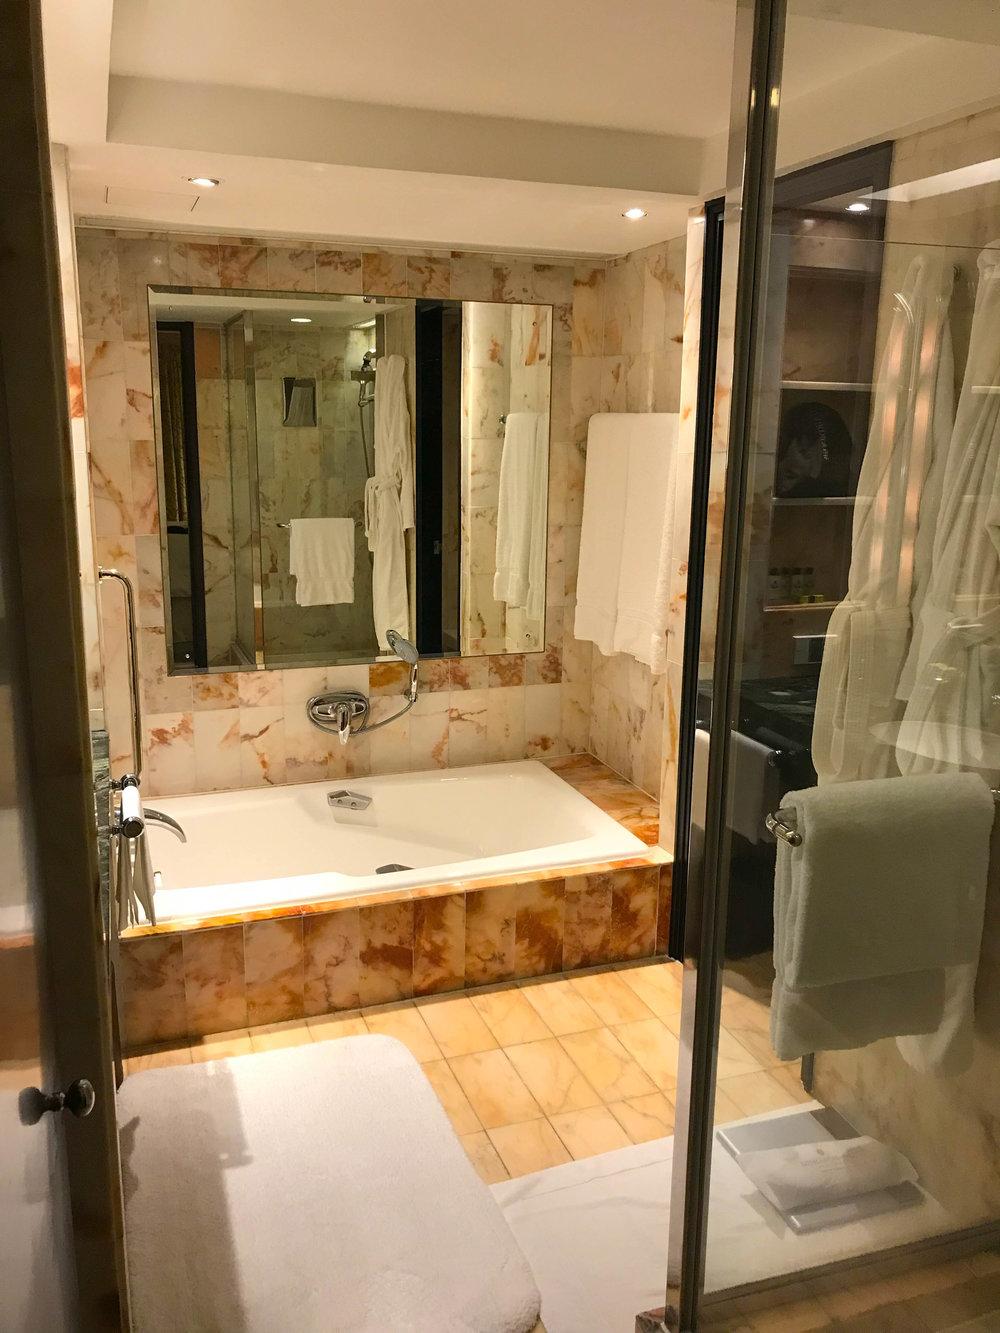 Hong Kong Intercontinental inside the Hotel room bathroom